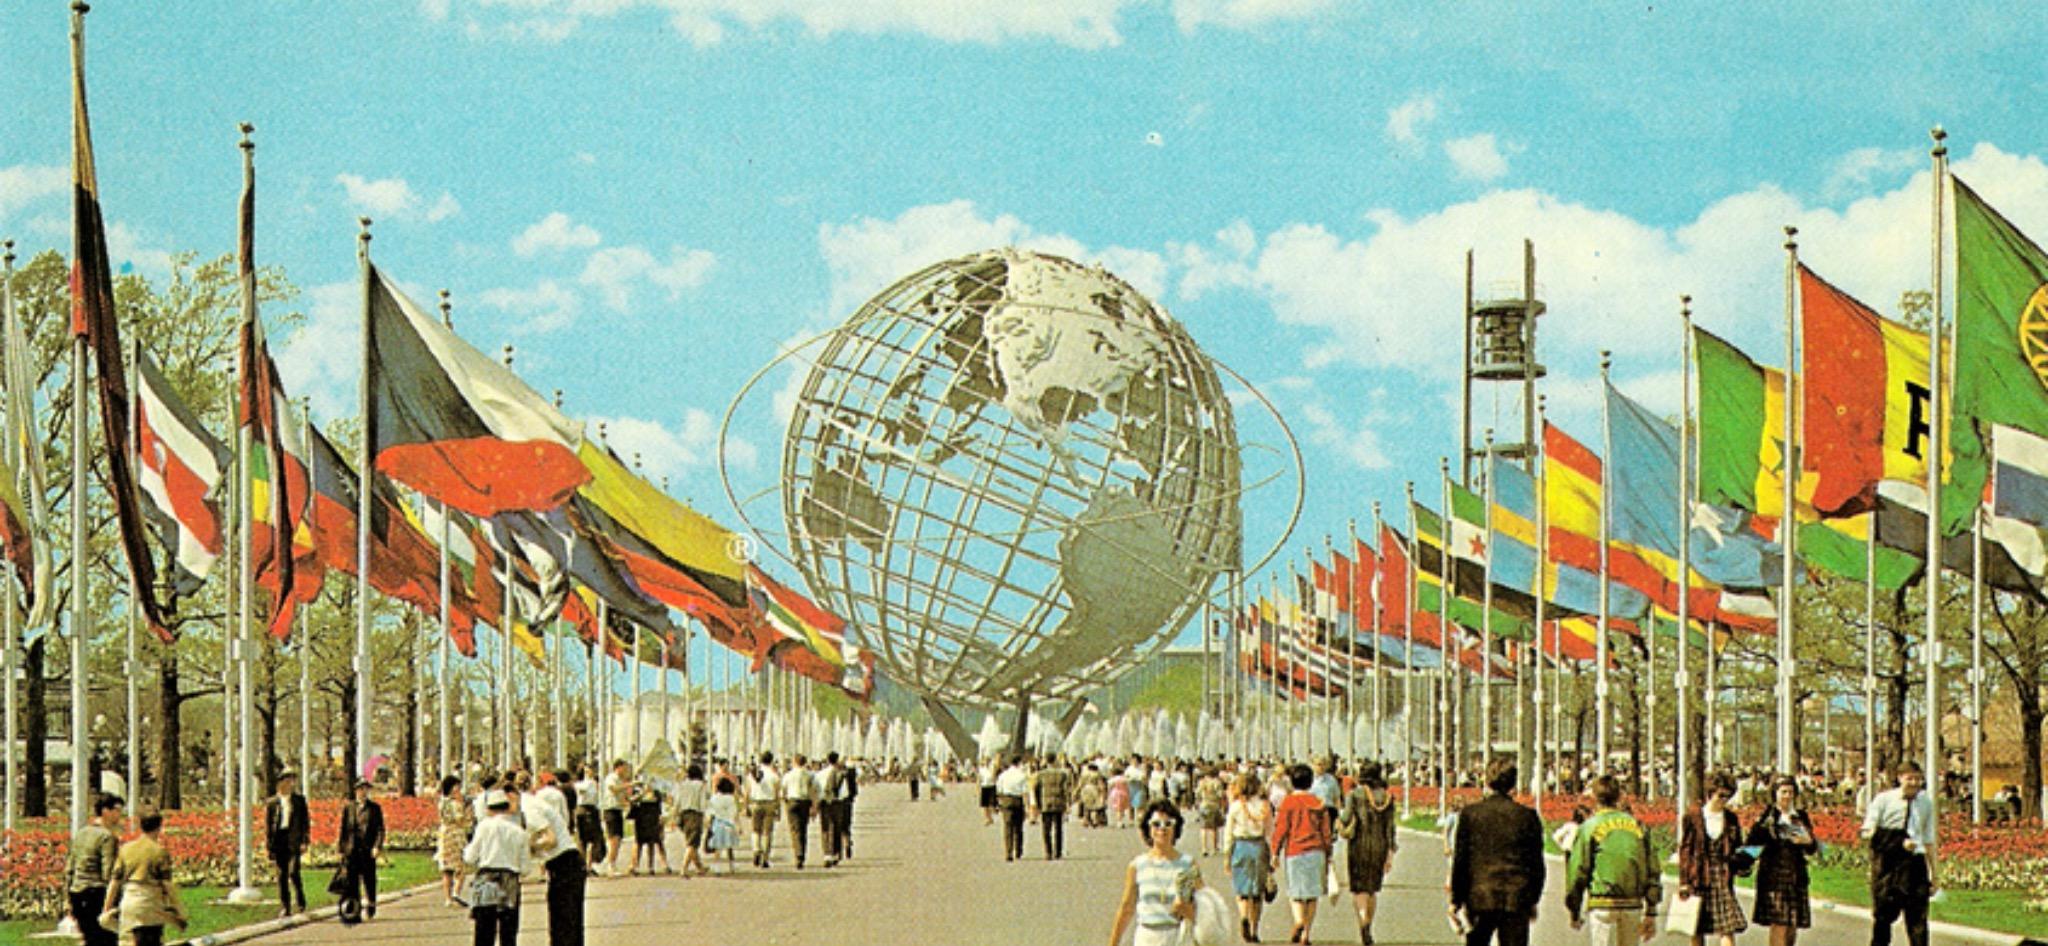 Coney Island Saved My Life